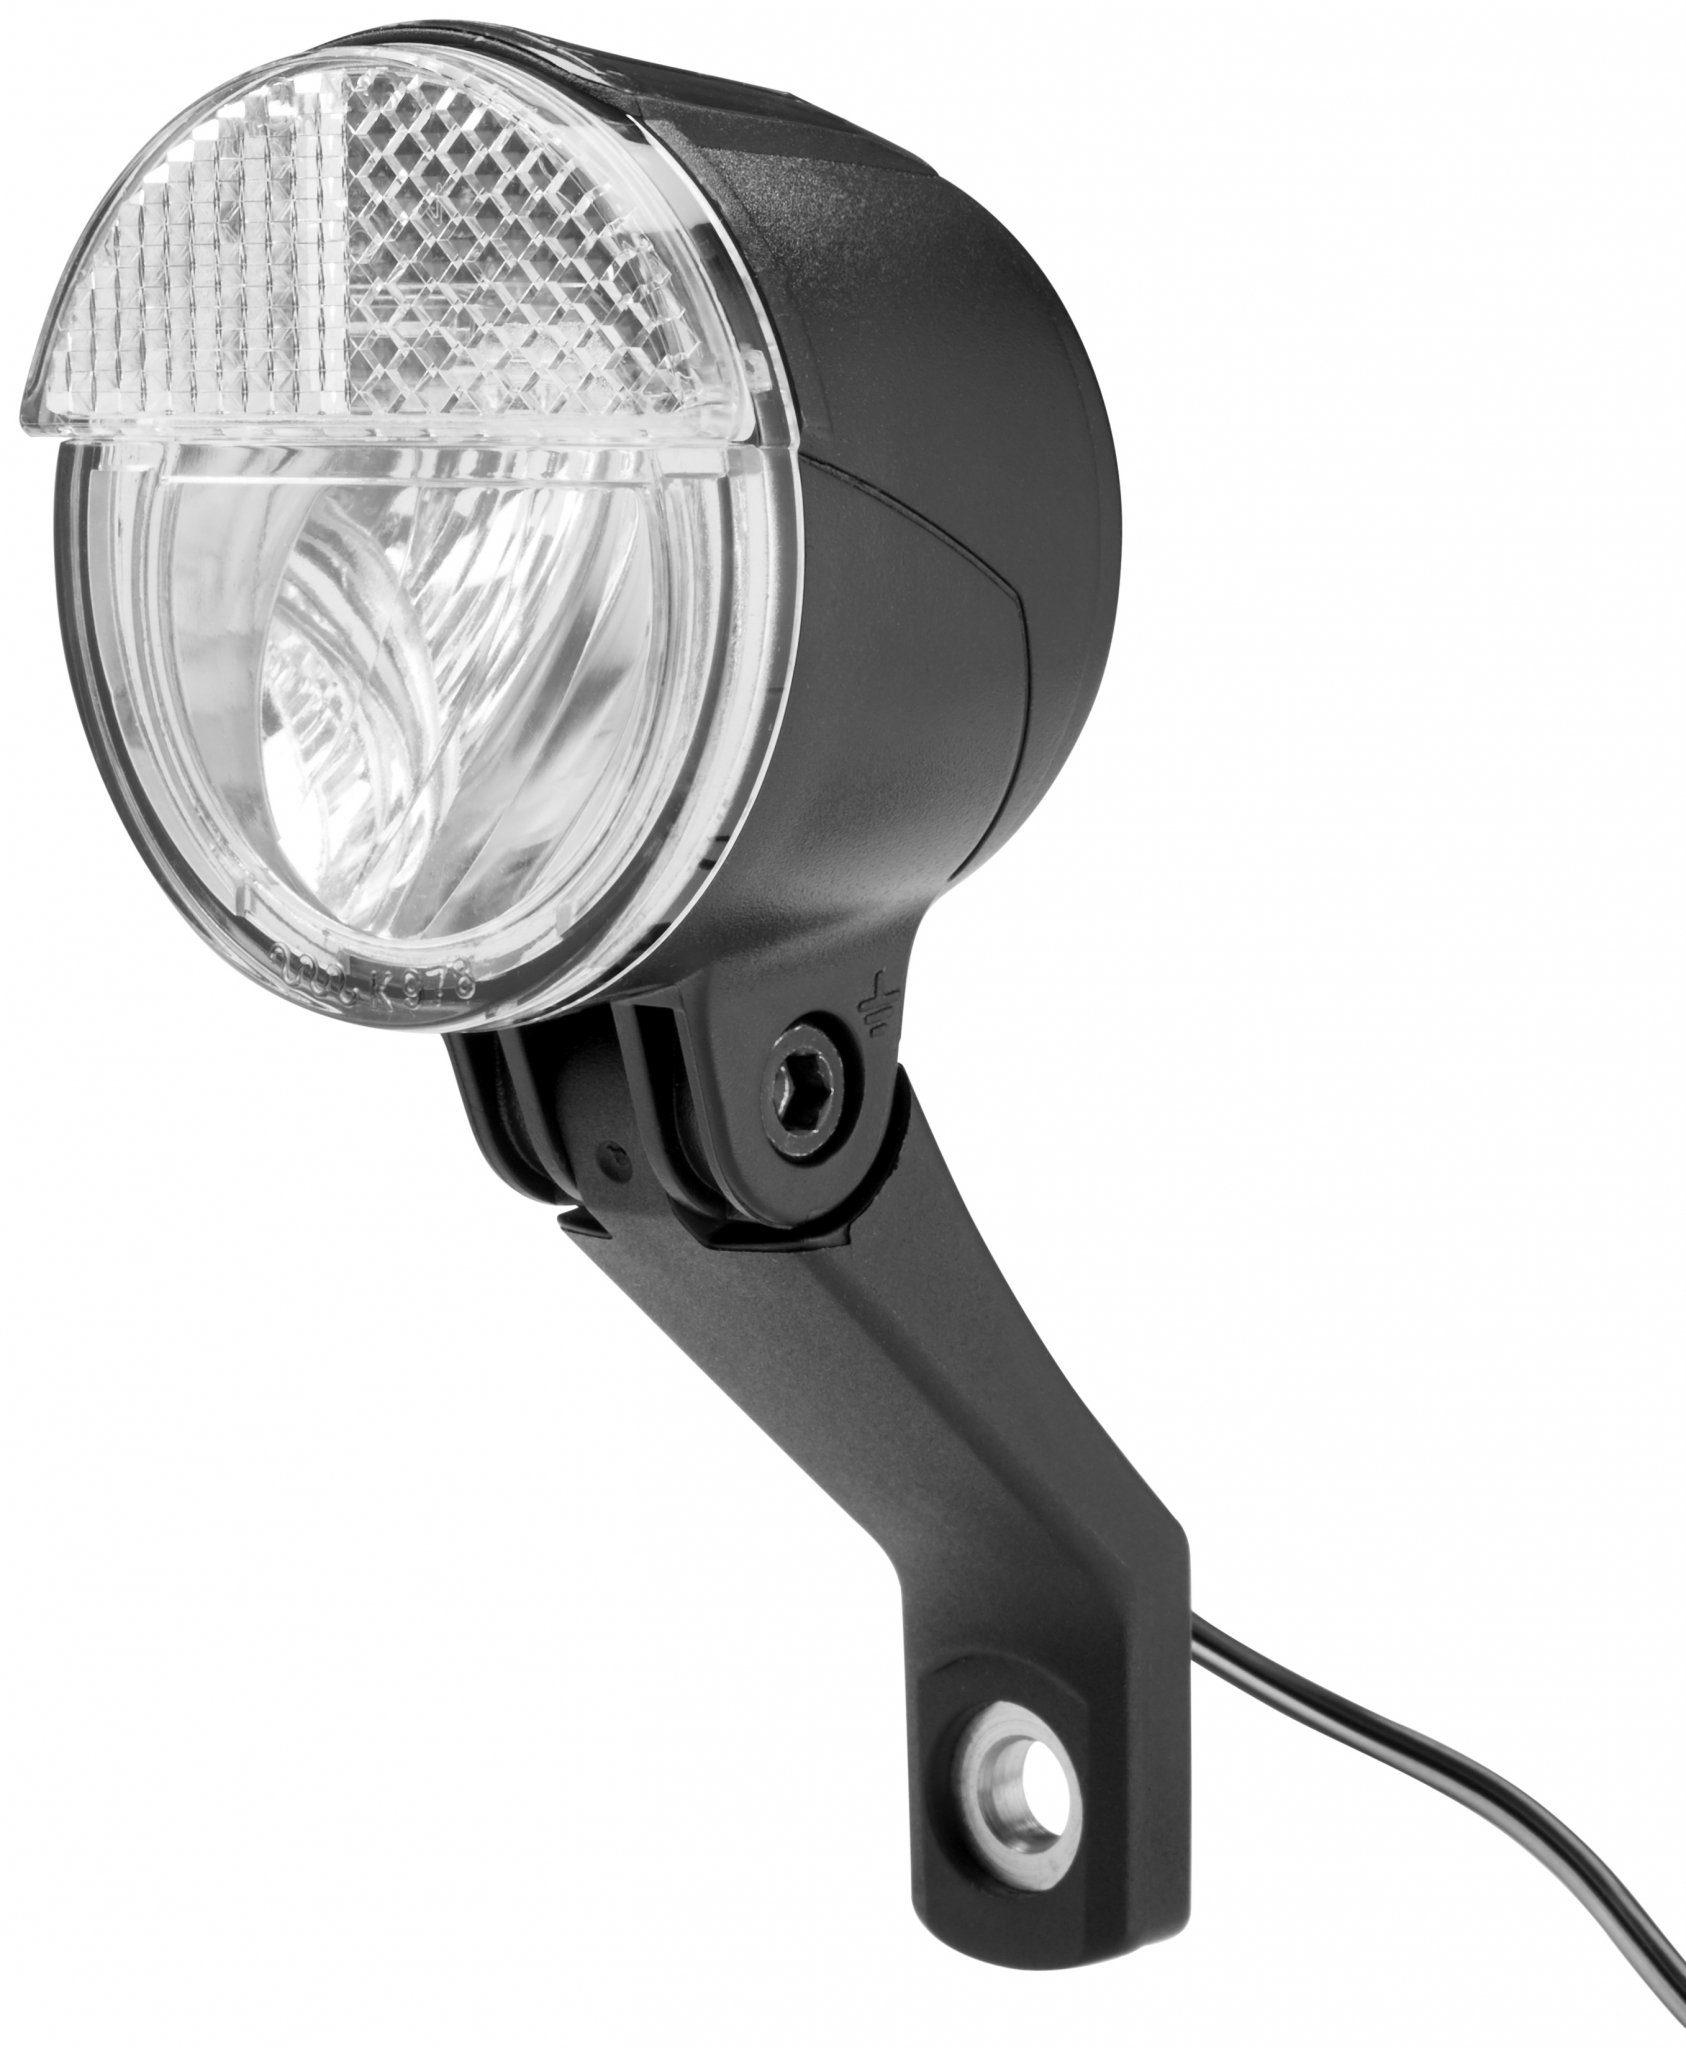 Trelock Fahrradbeleuchtung »LS 593 Bike-i mini Frontscheinwerfer«